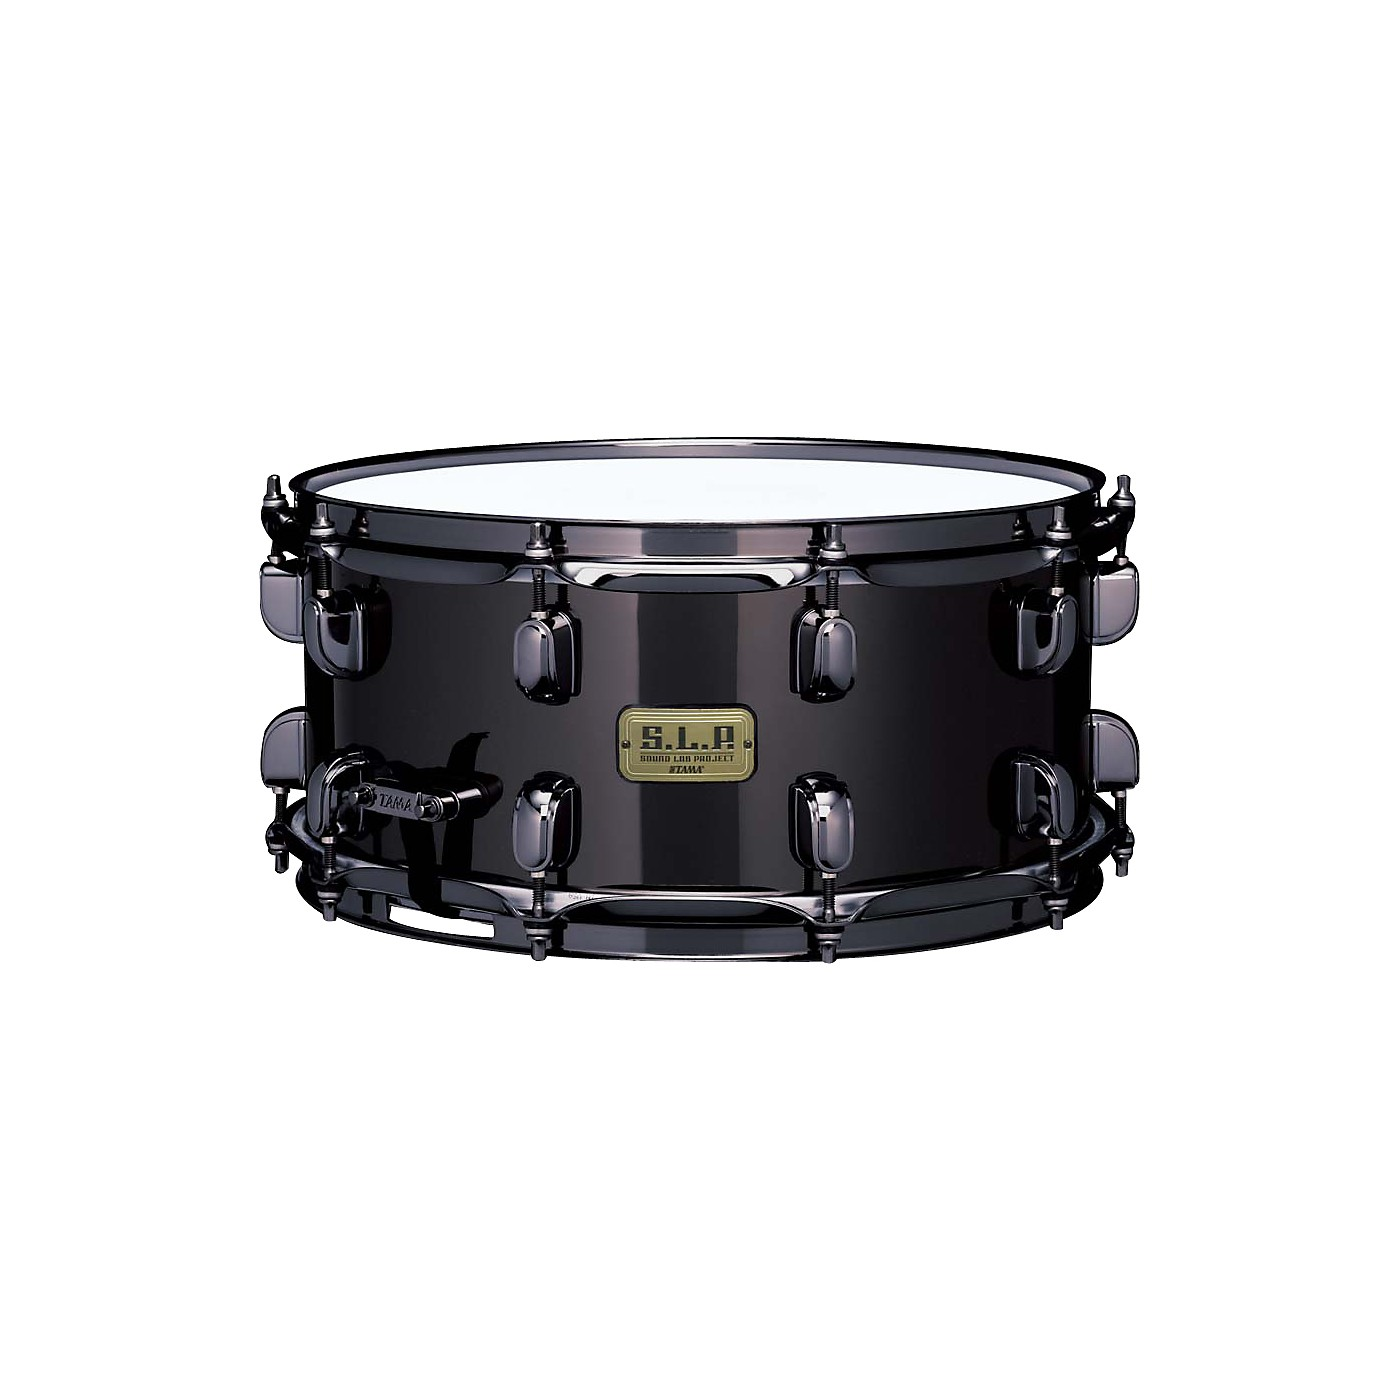 Tama LBR1465 SLP Brass Snare 14x6.5in